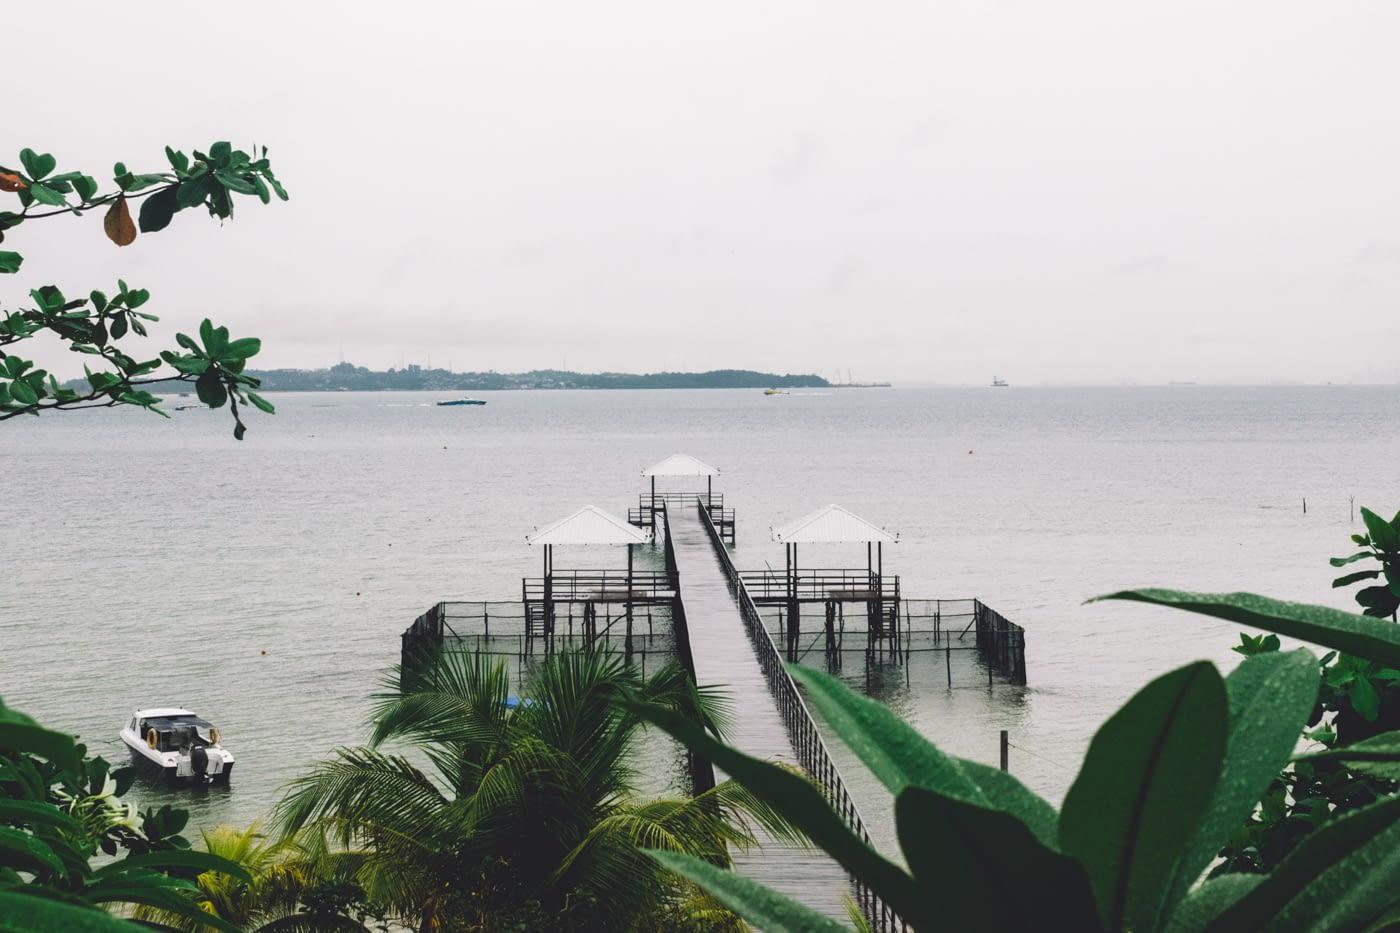 Indonesia - Montigo - Gloomy first day